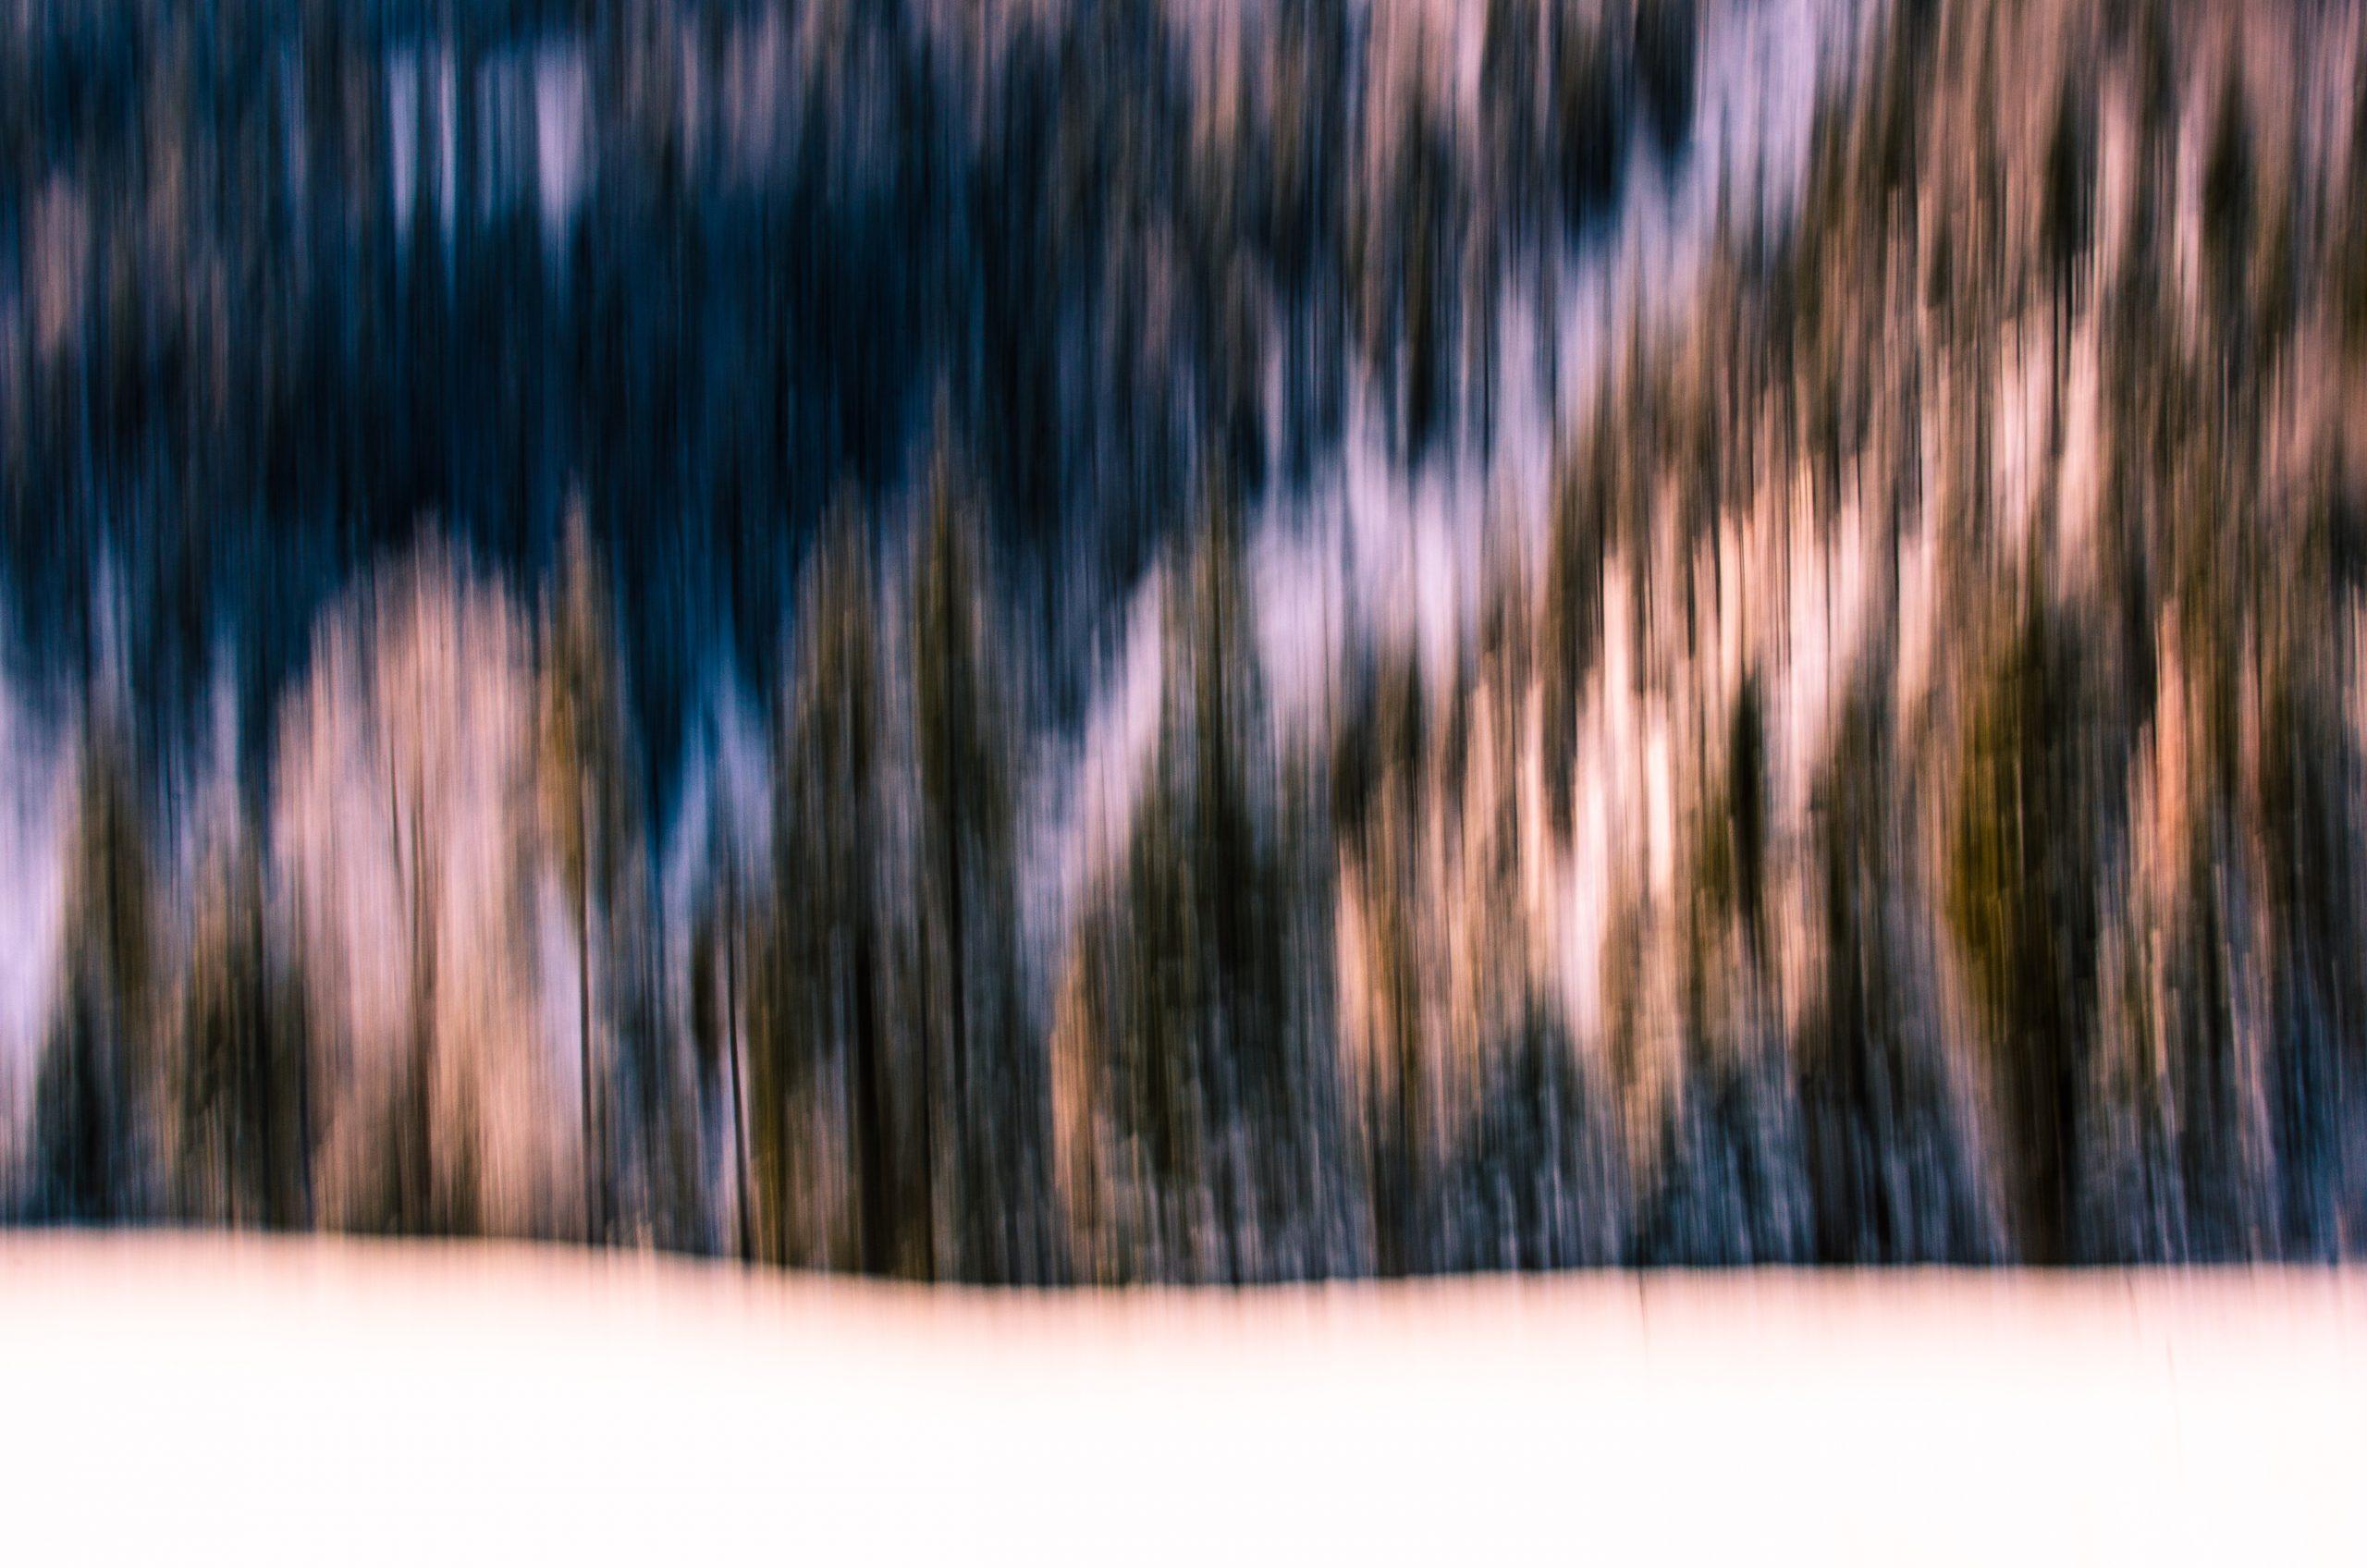 BL_Magnetic_Forest_-Alpenvorland-_SebastianKrawczyk